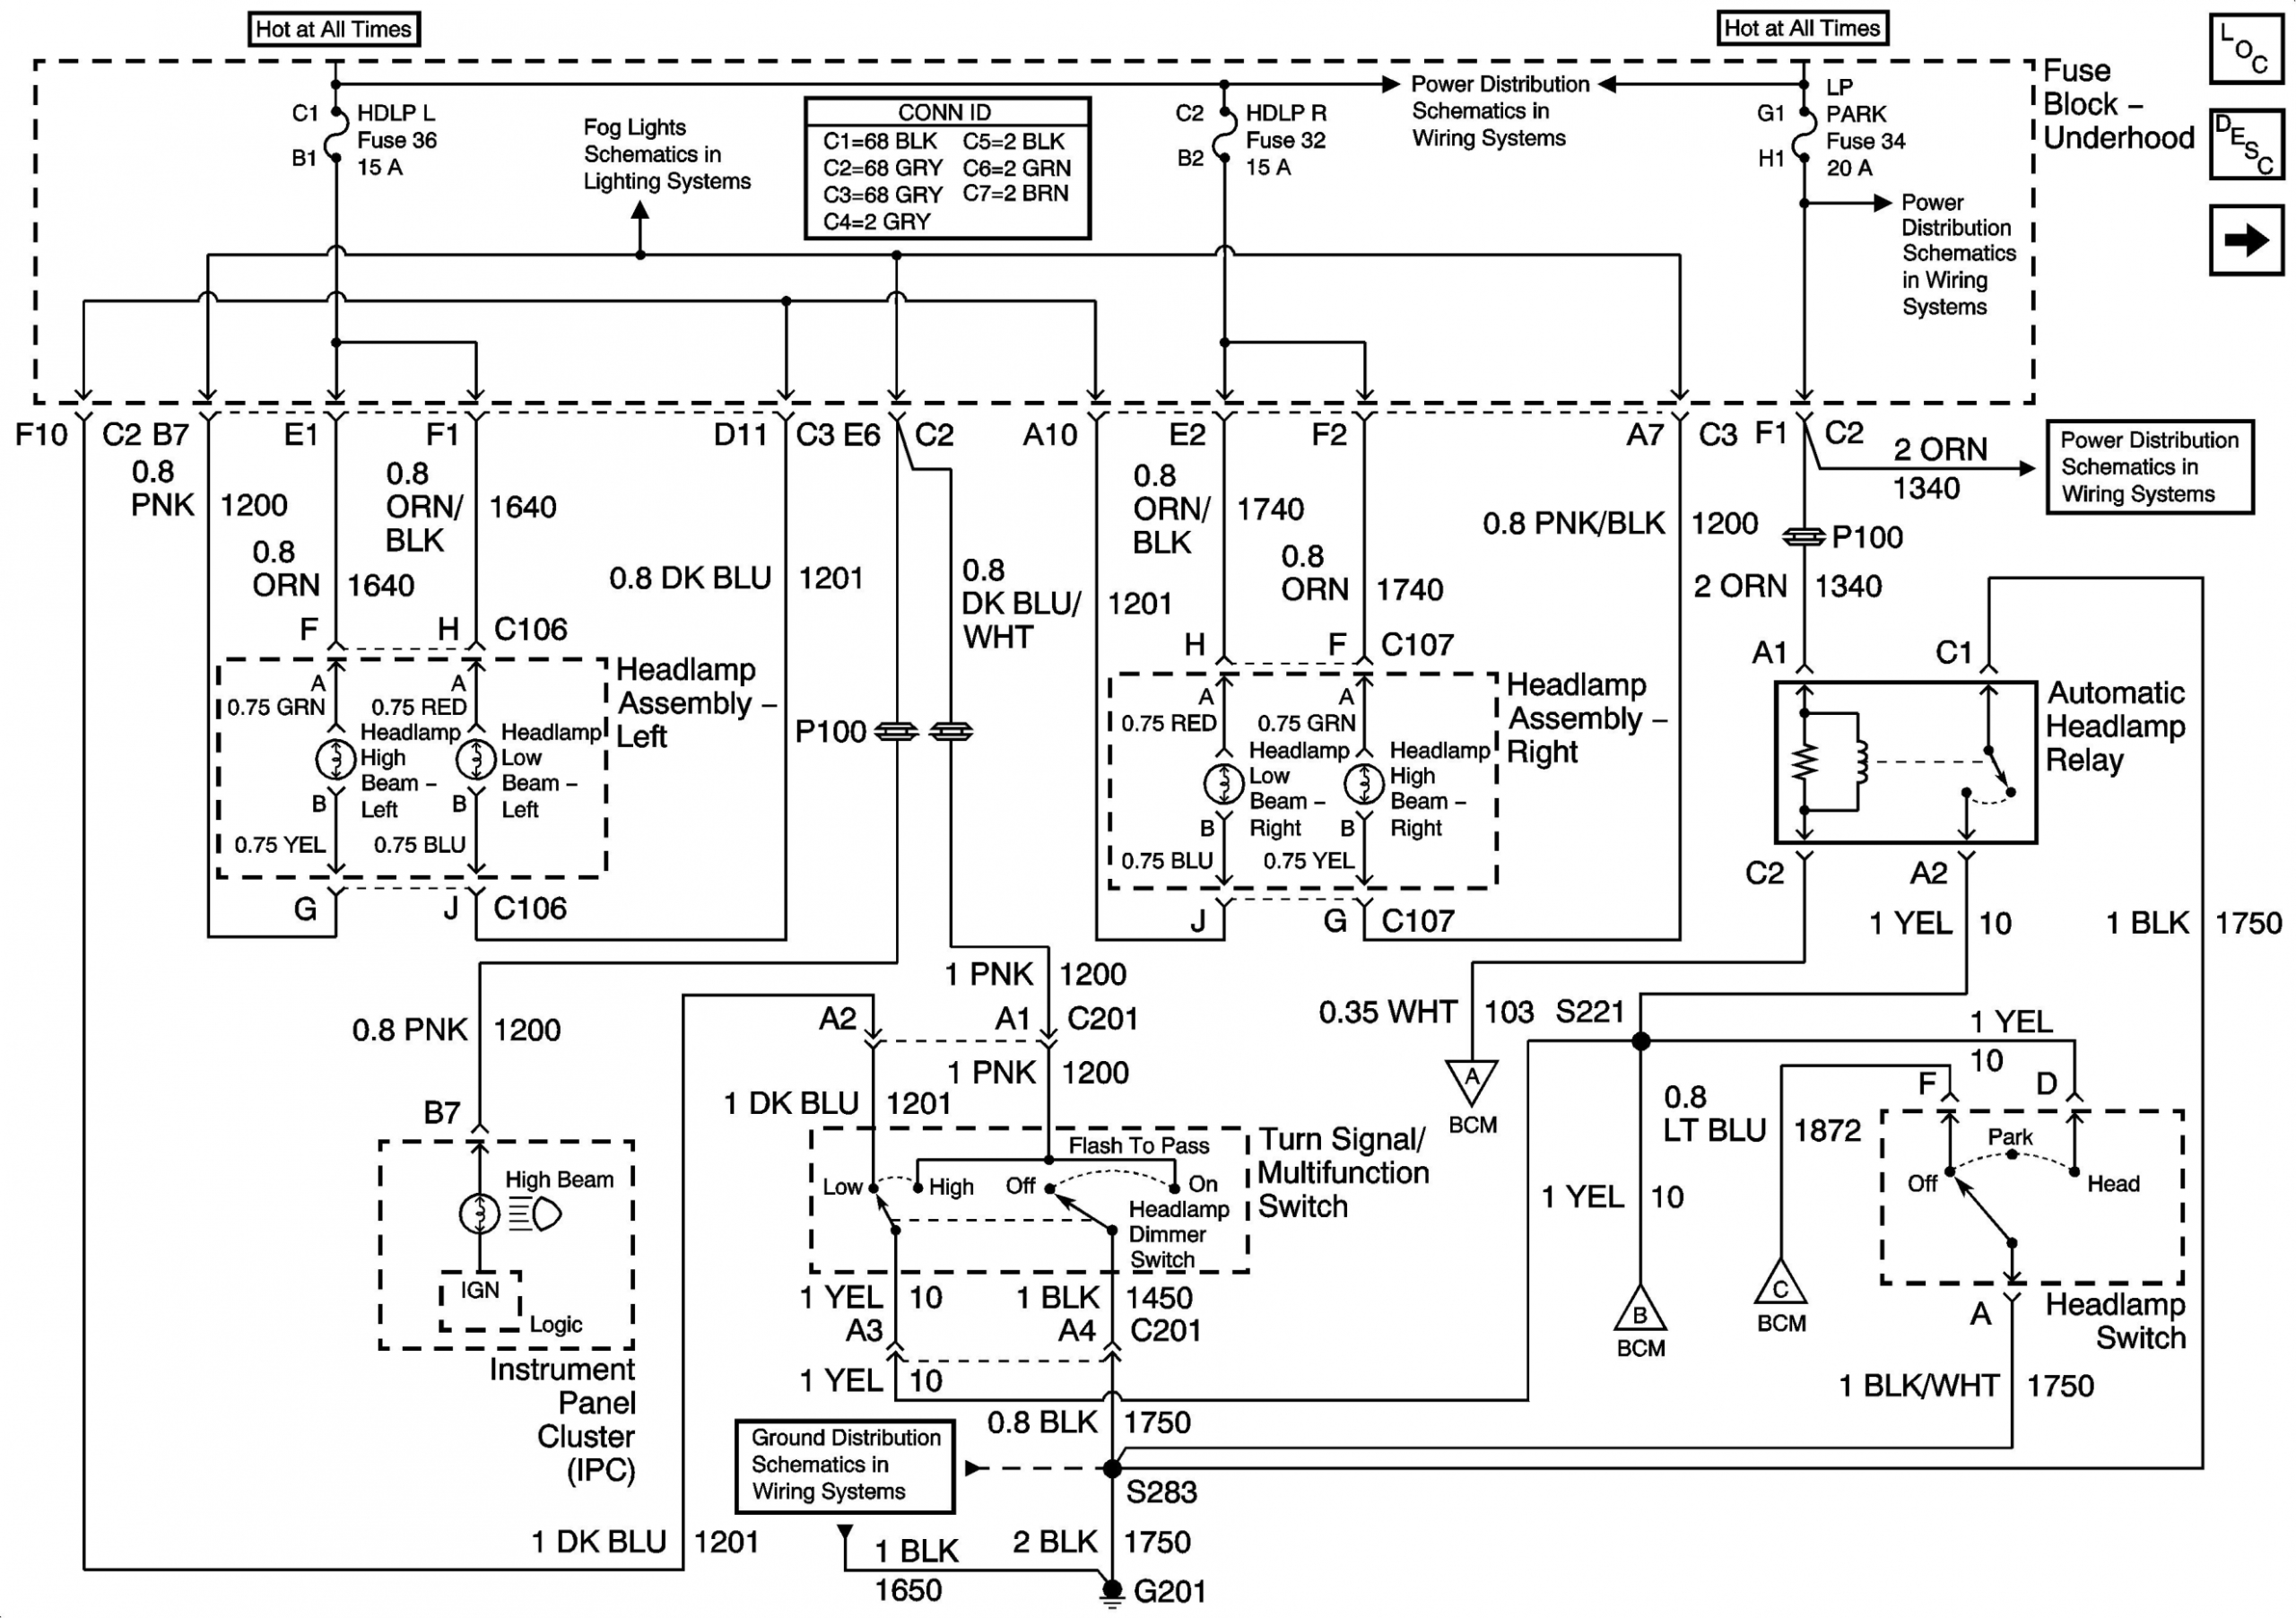 10 Tata Car Wiring Diagram Tata Cars Electrical Wiring Diagram Tata